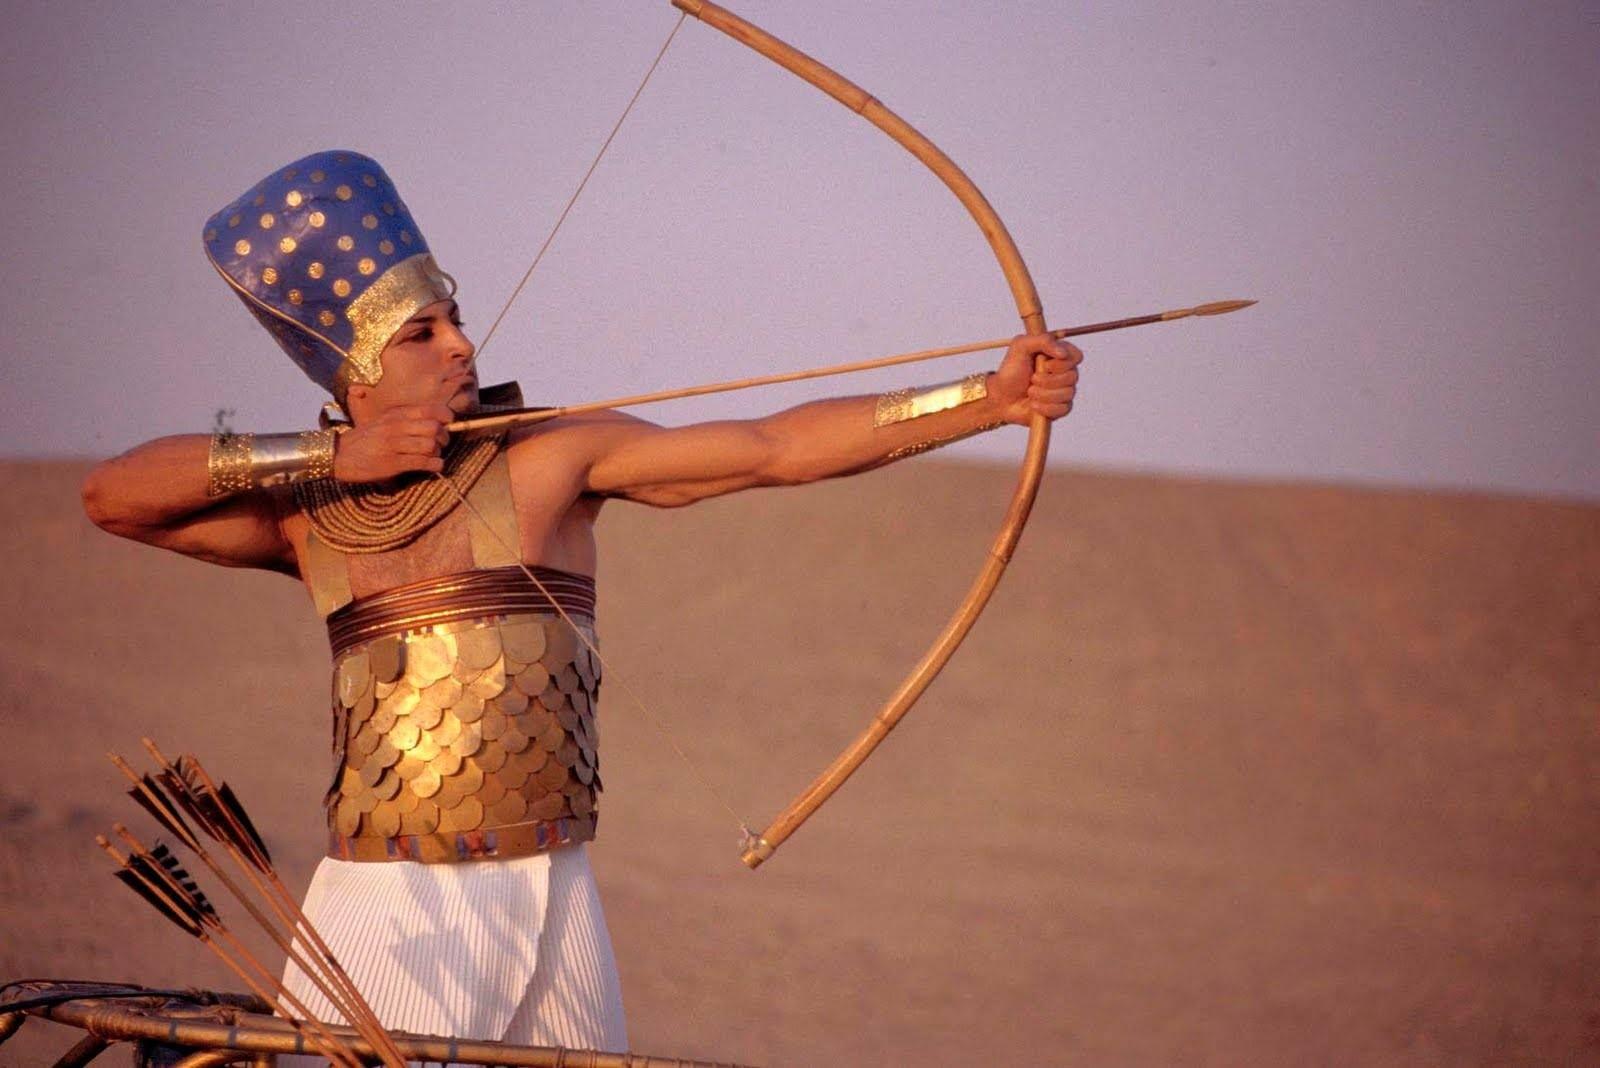 Egyptian Bow And Arrow Egyptian Warrior Ancient History